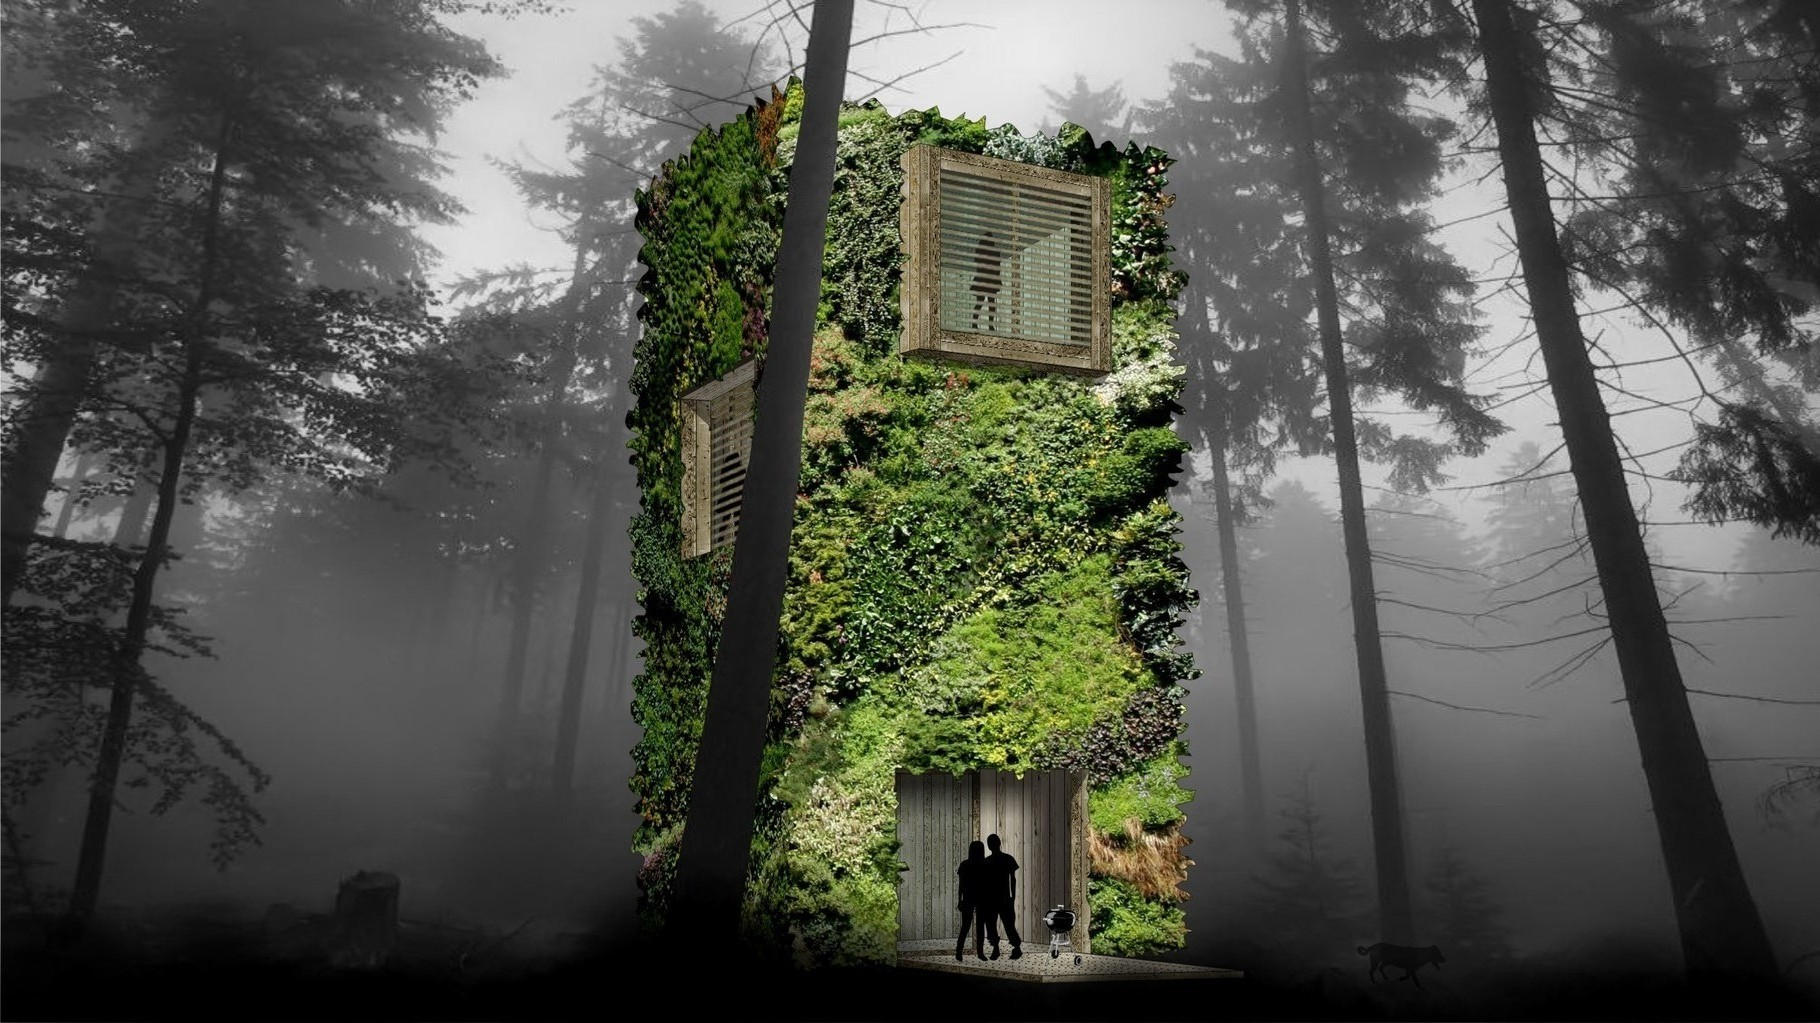 The no 1 treehouses ecoresorts oas1s Architecture nature